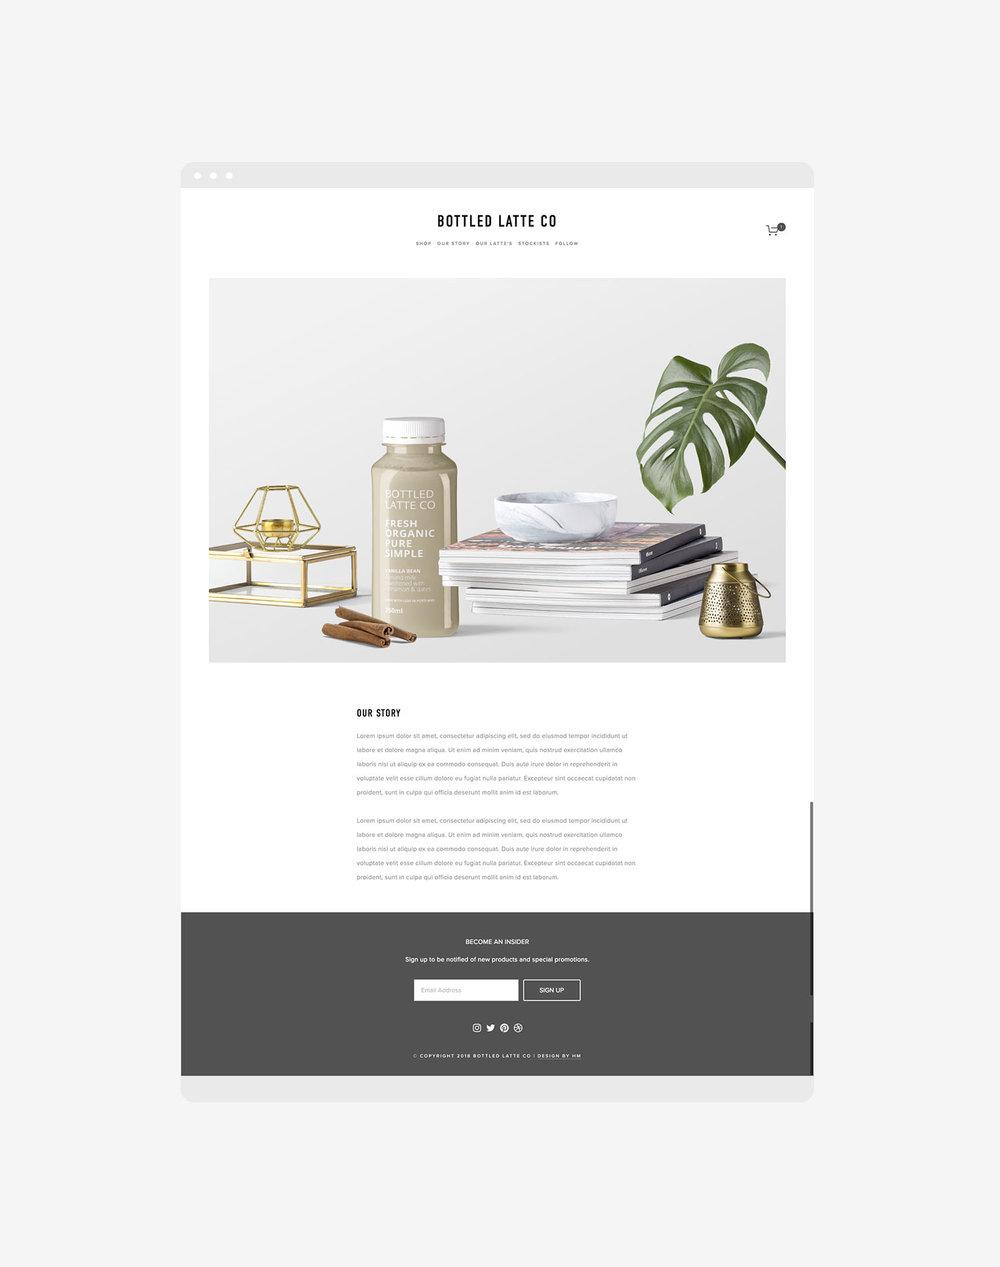 BottledLatteCo-Heather-Maehr-Website-Designer-Portland-Squarespace-E-Commerce-Products.jpg